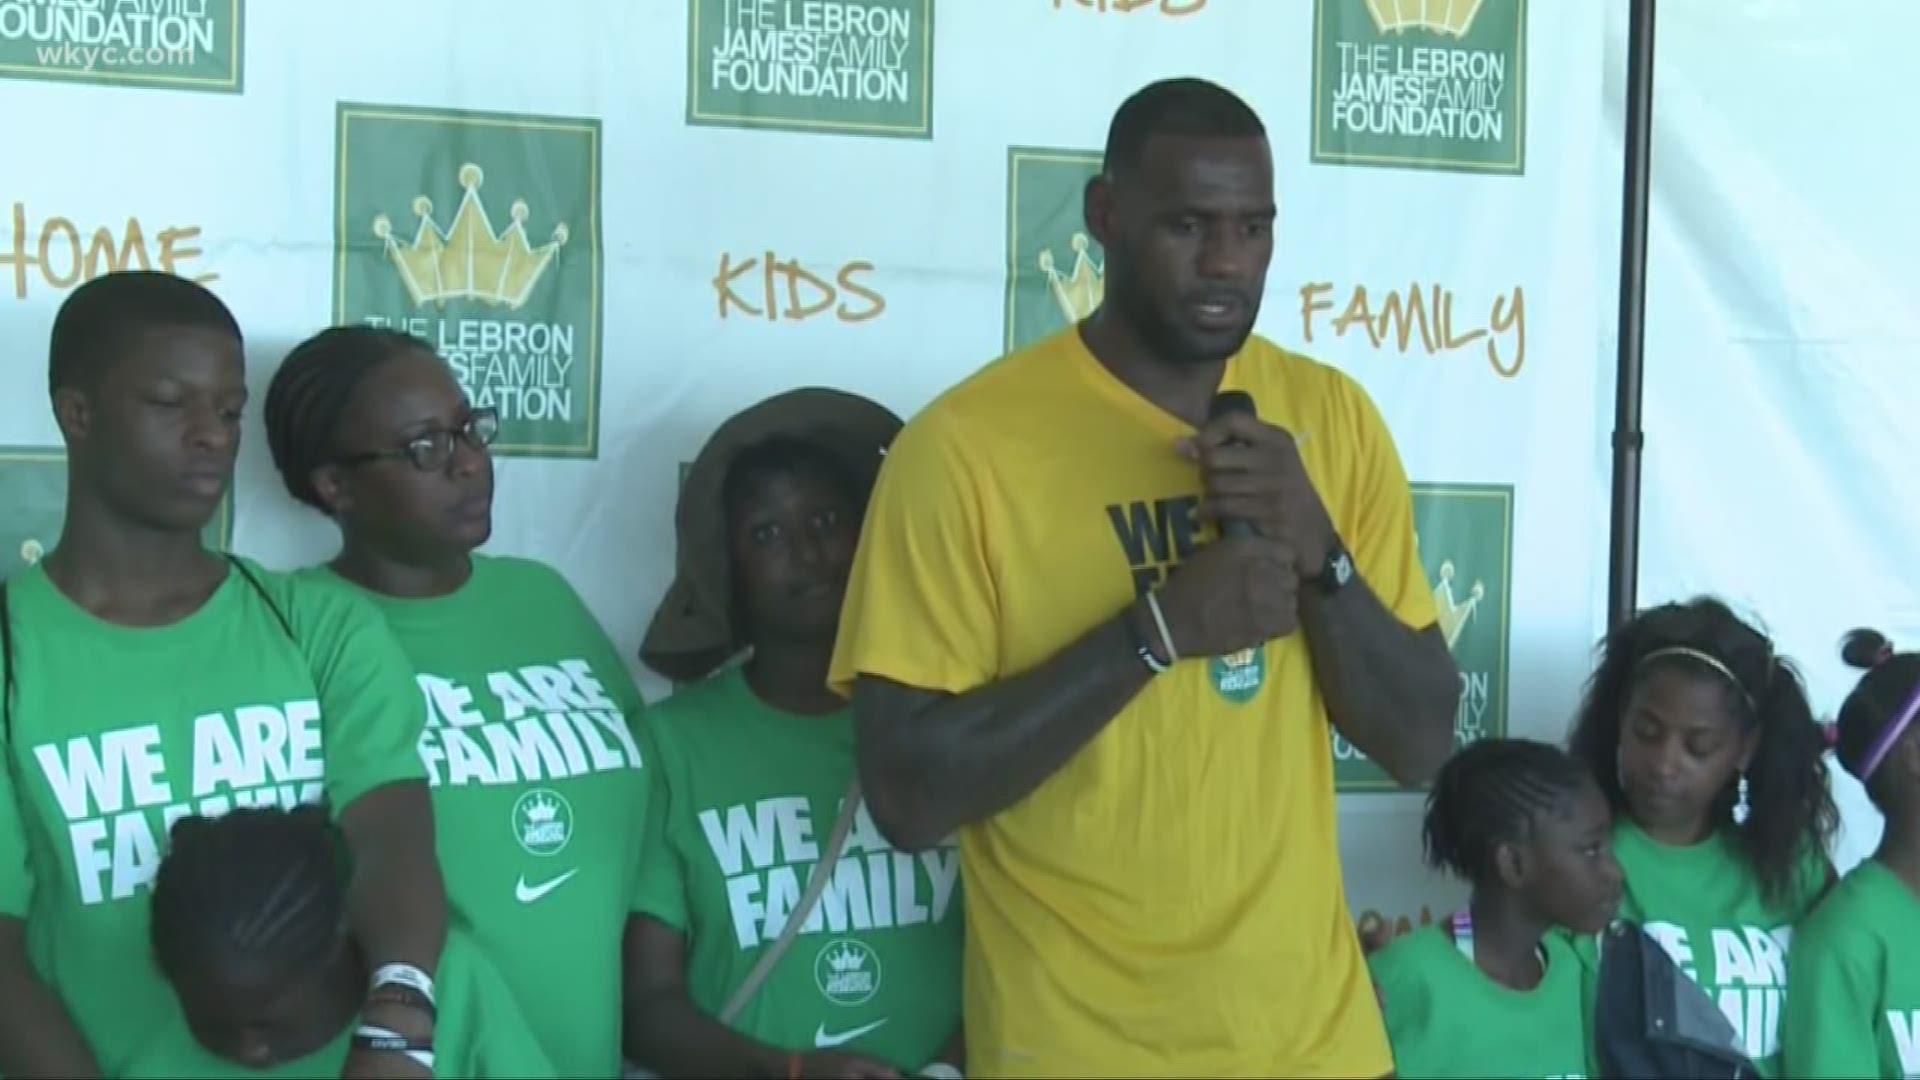 LeBron James Family Foundation: LeBron